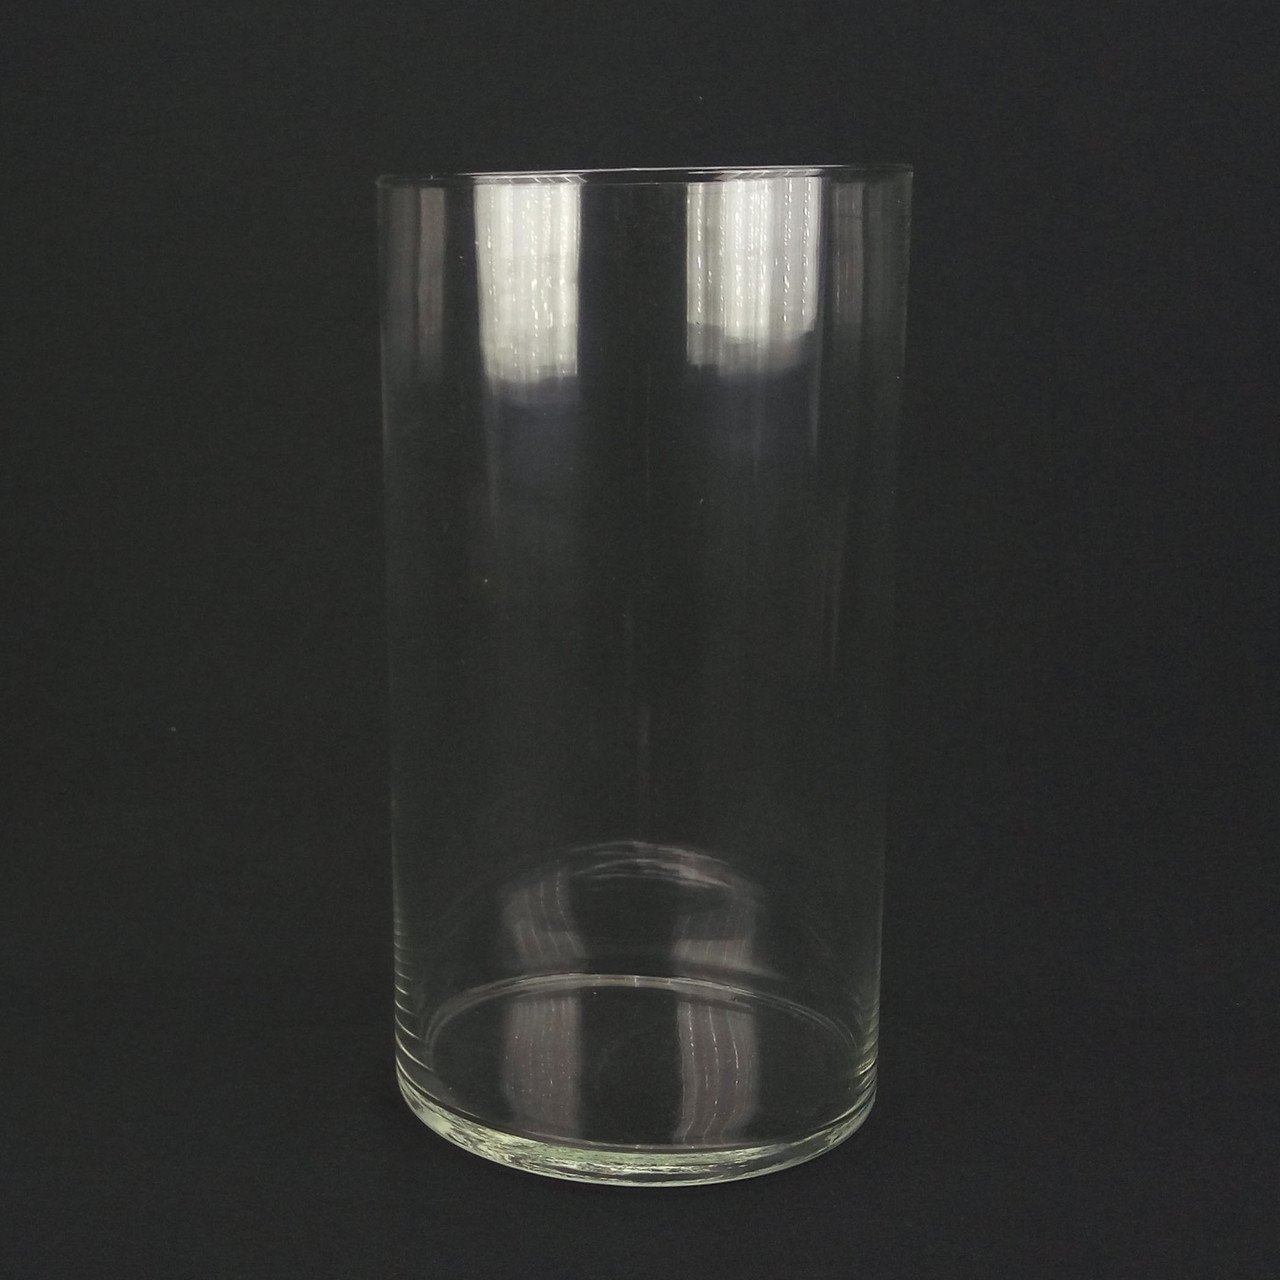 Подсвечник h 30 см, Ø 16 см, колба